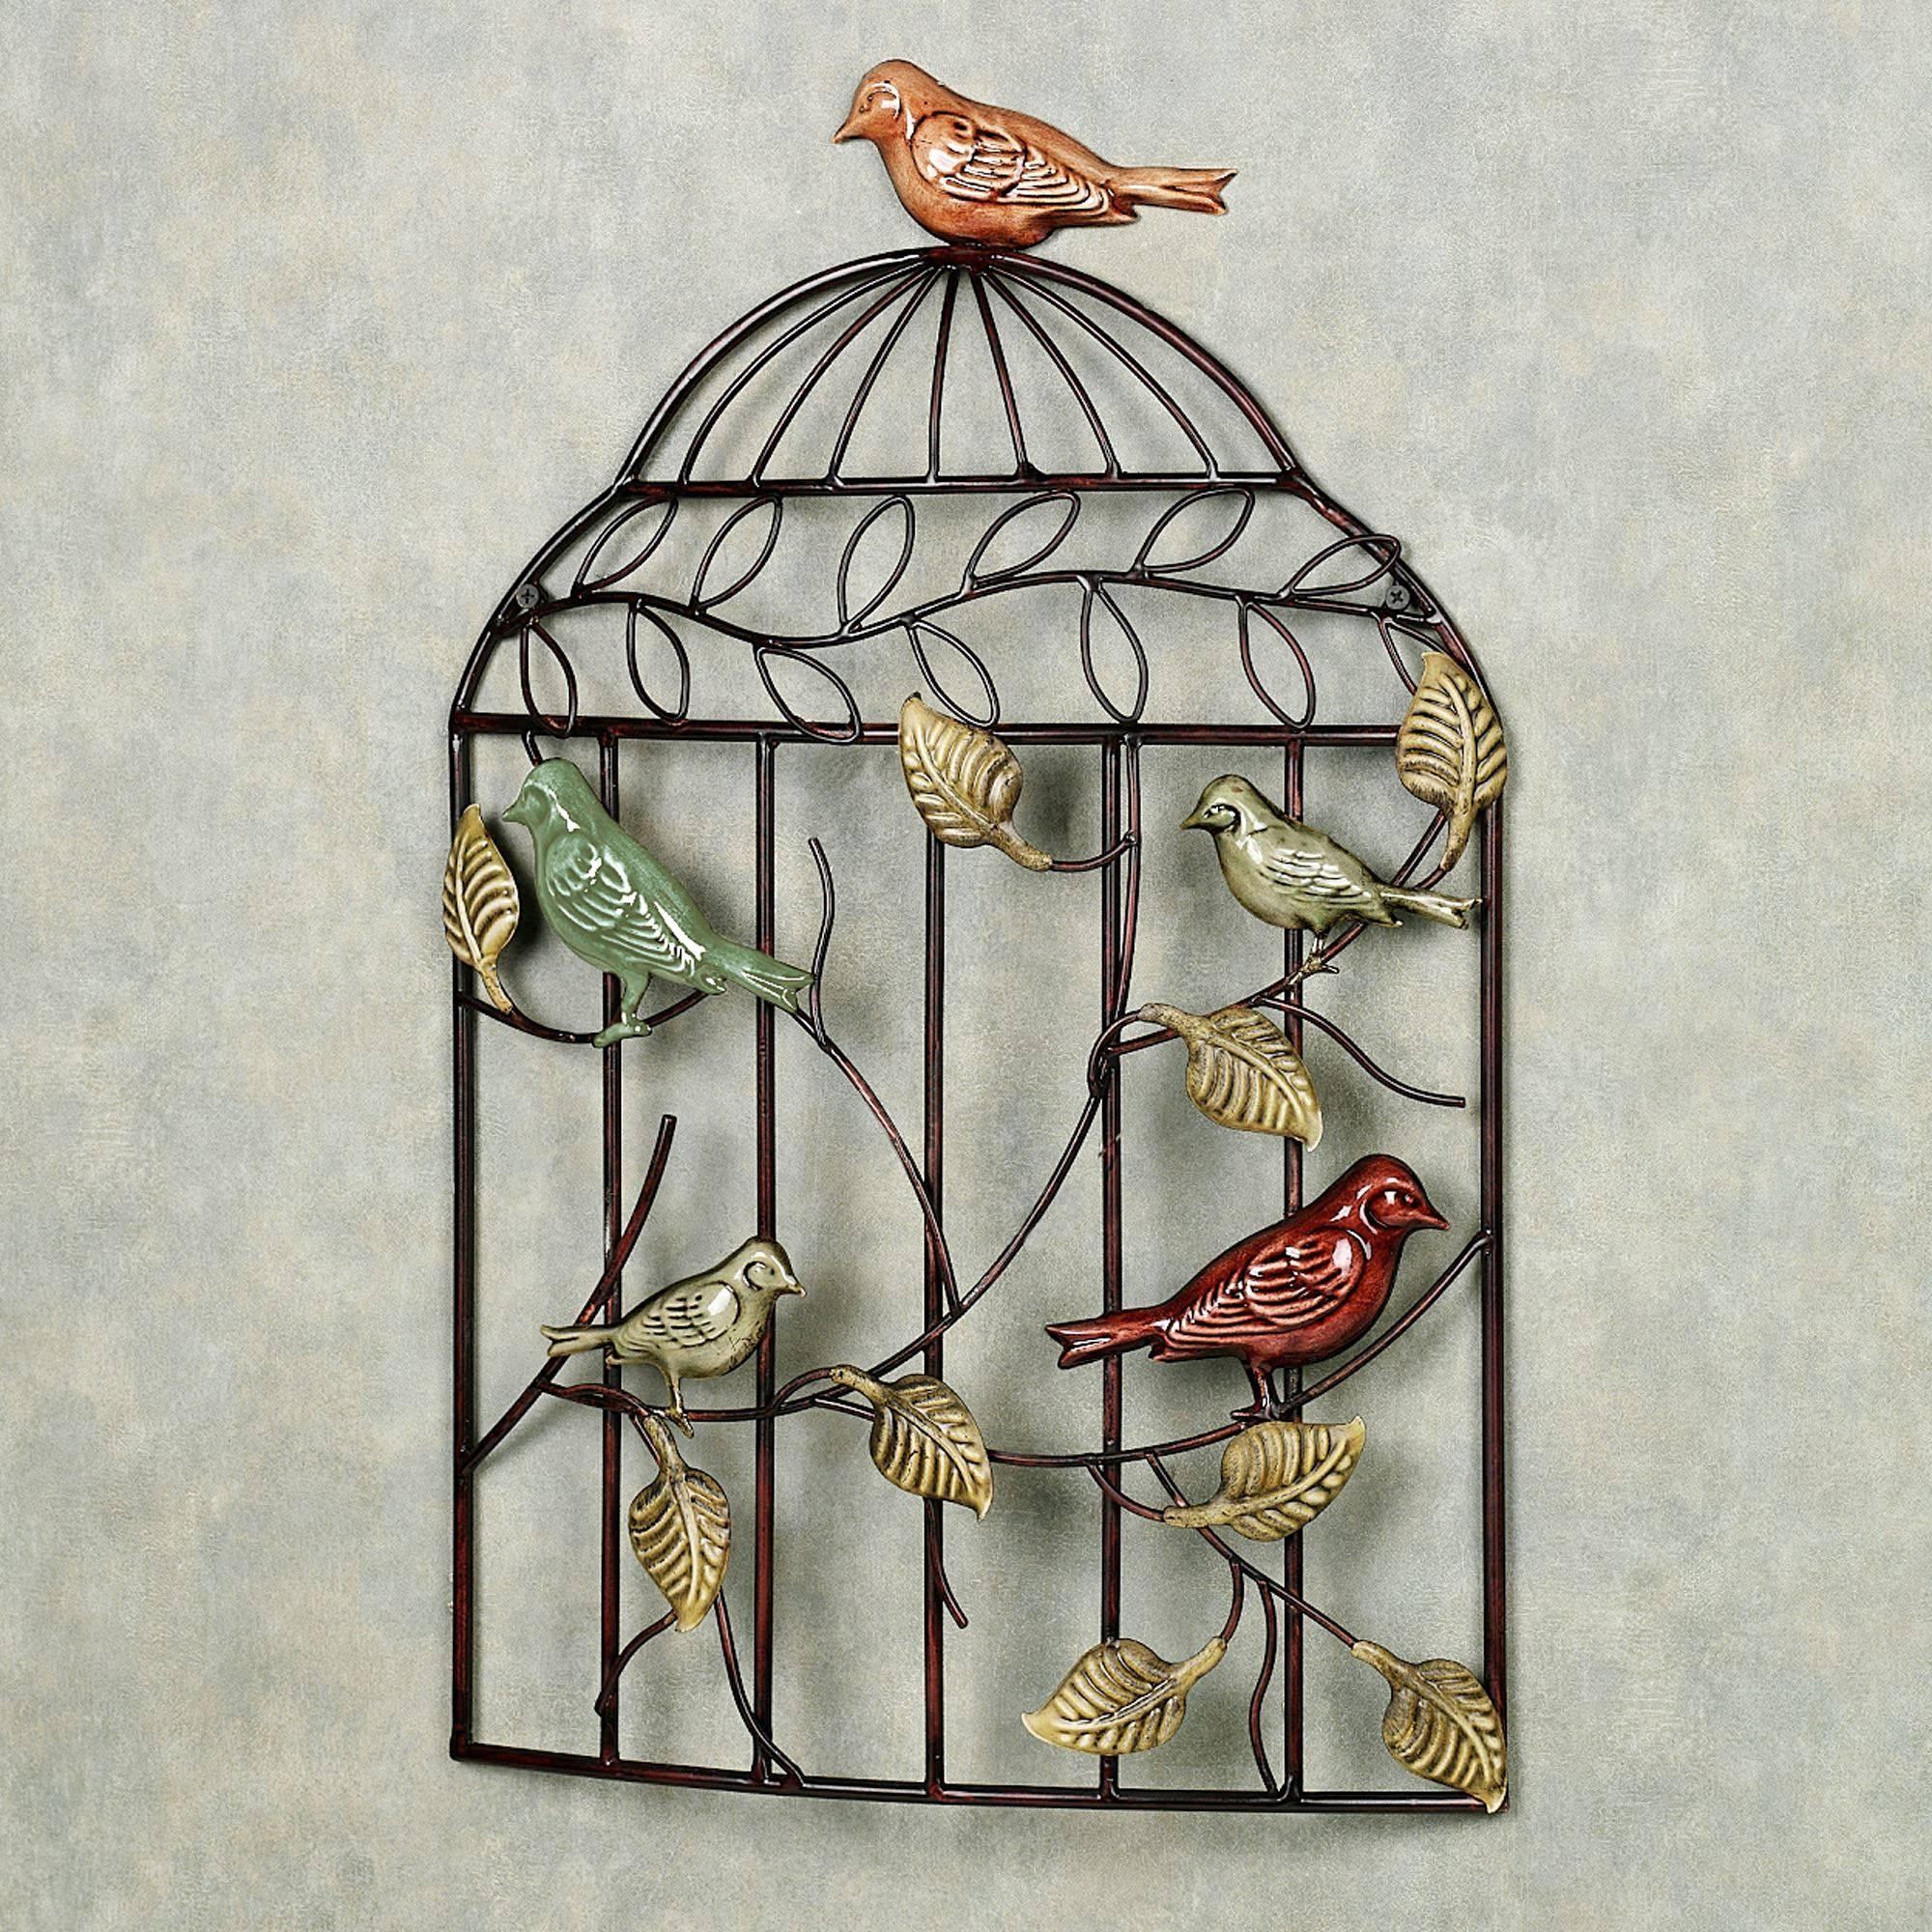 Bird Sanctuary Cage Metal Wall Art Regarding Most Popular Metal Birdcage Wall Art (View 2 of 15)